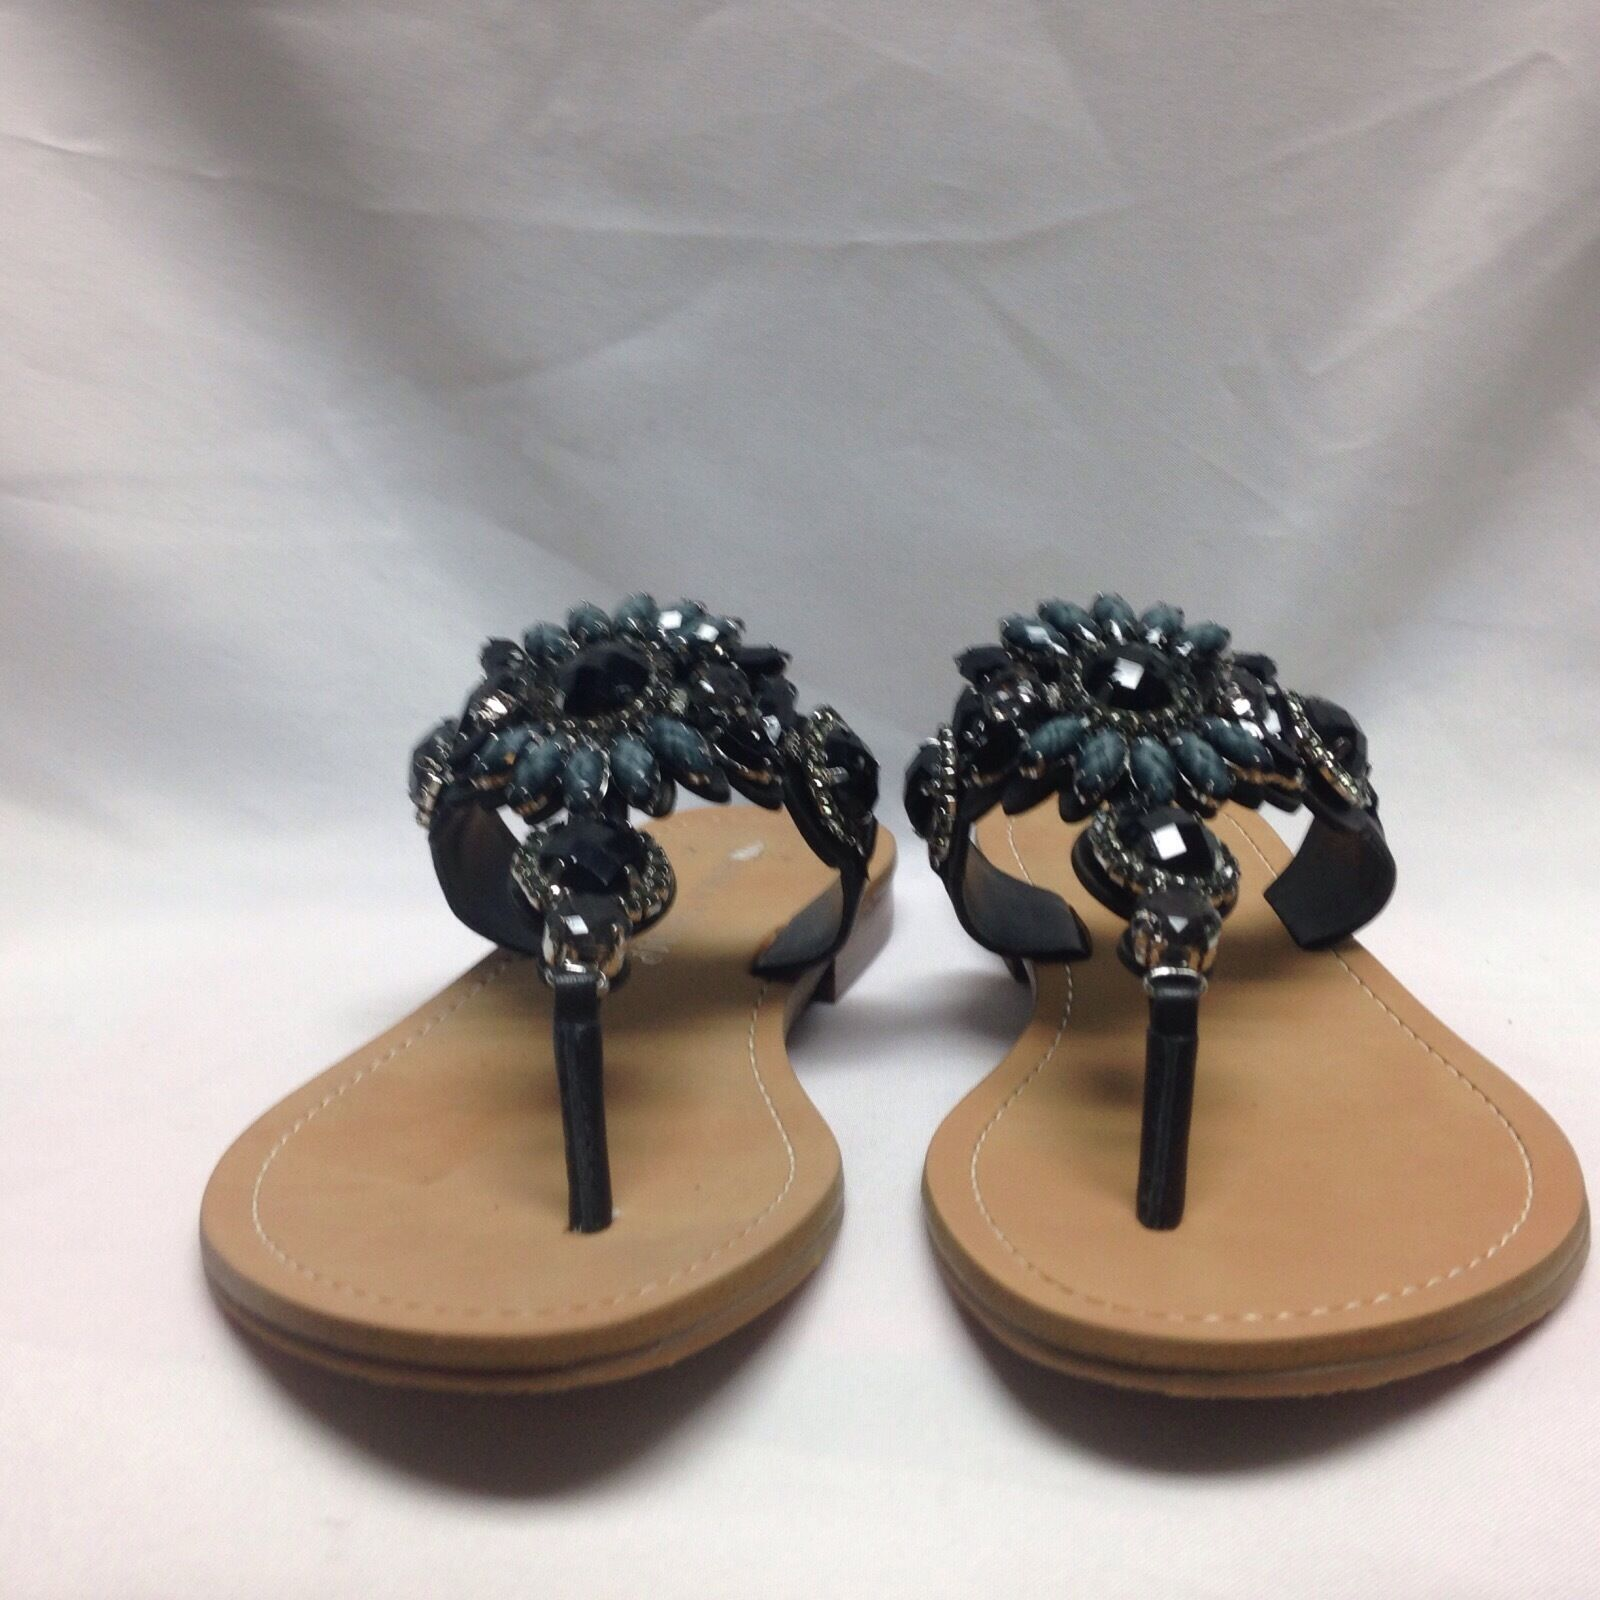 Ivanka Trump Palista Jewel Sandal  5.5 M nero Leather Leather Leather New w  Box 83b854